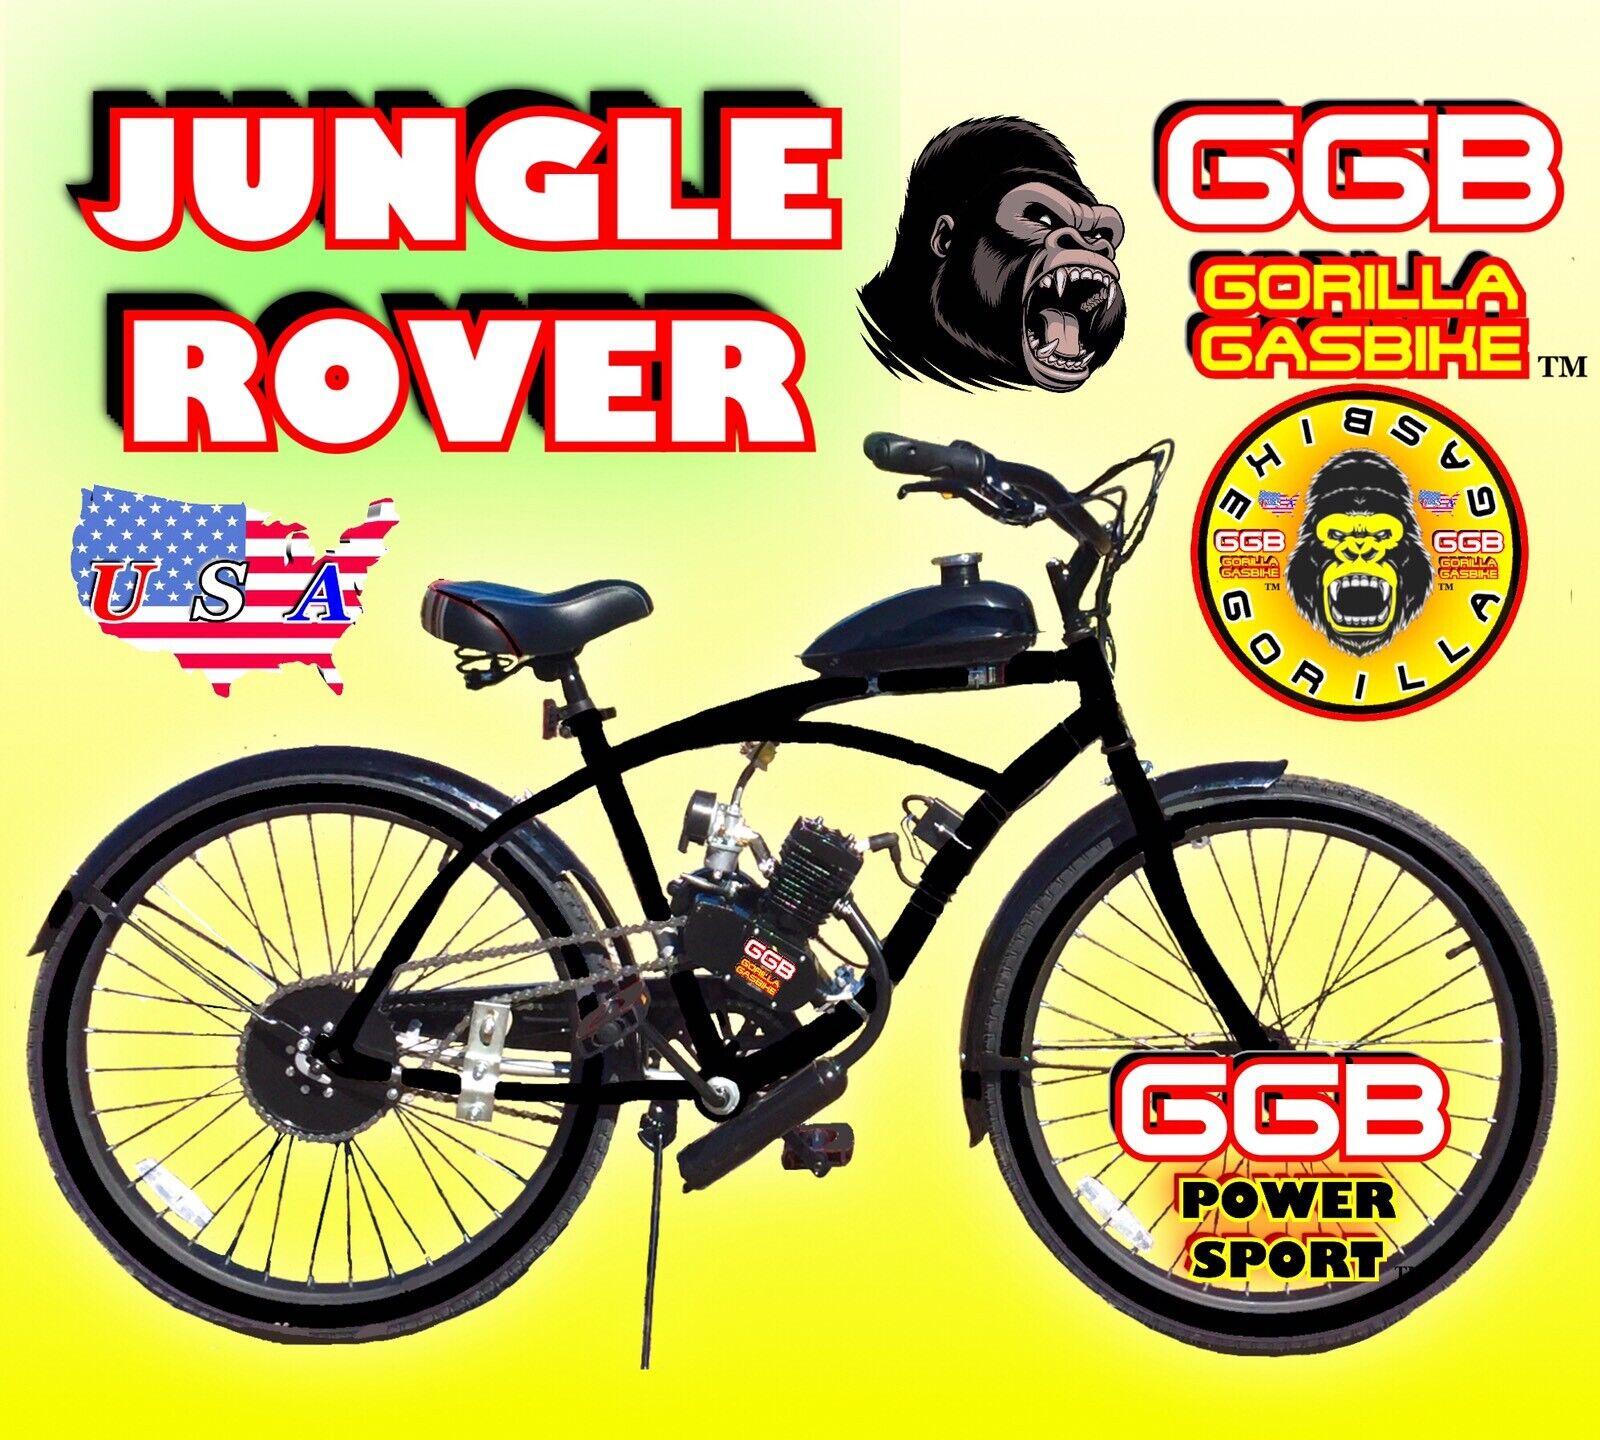 49cc 48cc 50cc 66cc 80cc 2-STROKE MOTORIZED BIKE KIT AND 26  BICYCLE DIY